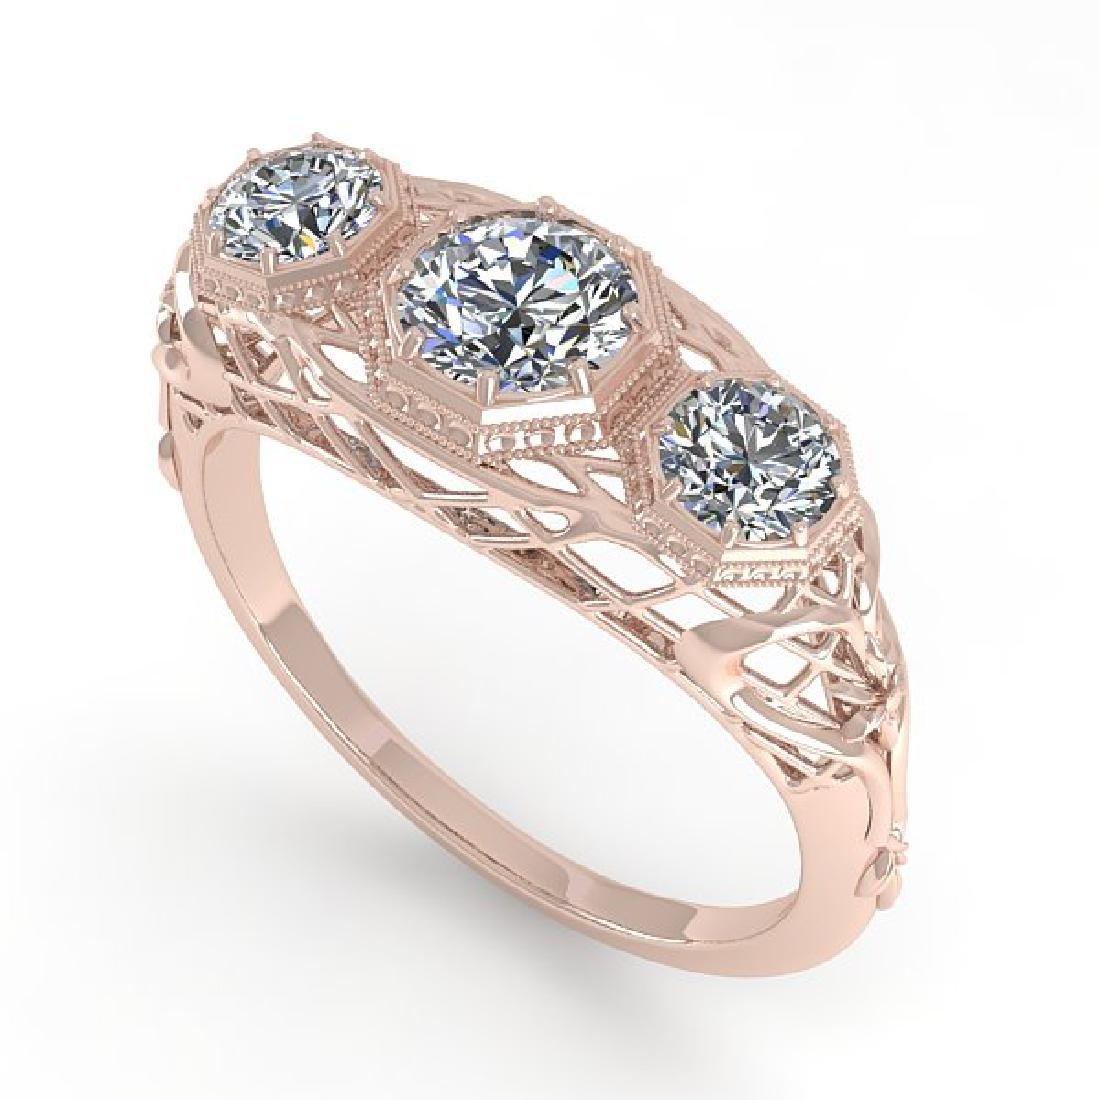 1.00 CTW VS/SI Diamond Art Deco Ring 14K Rose Gold - 2